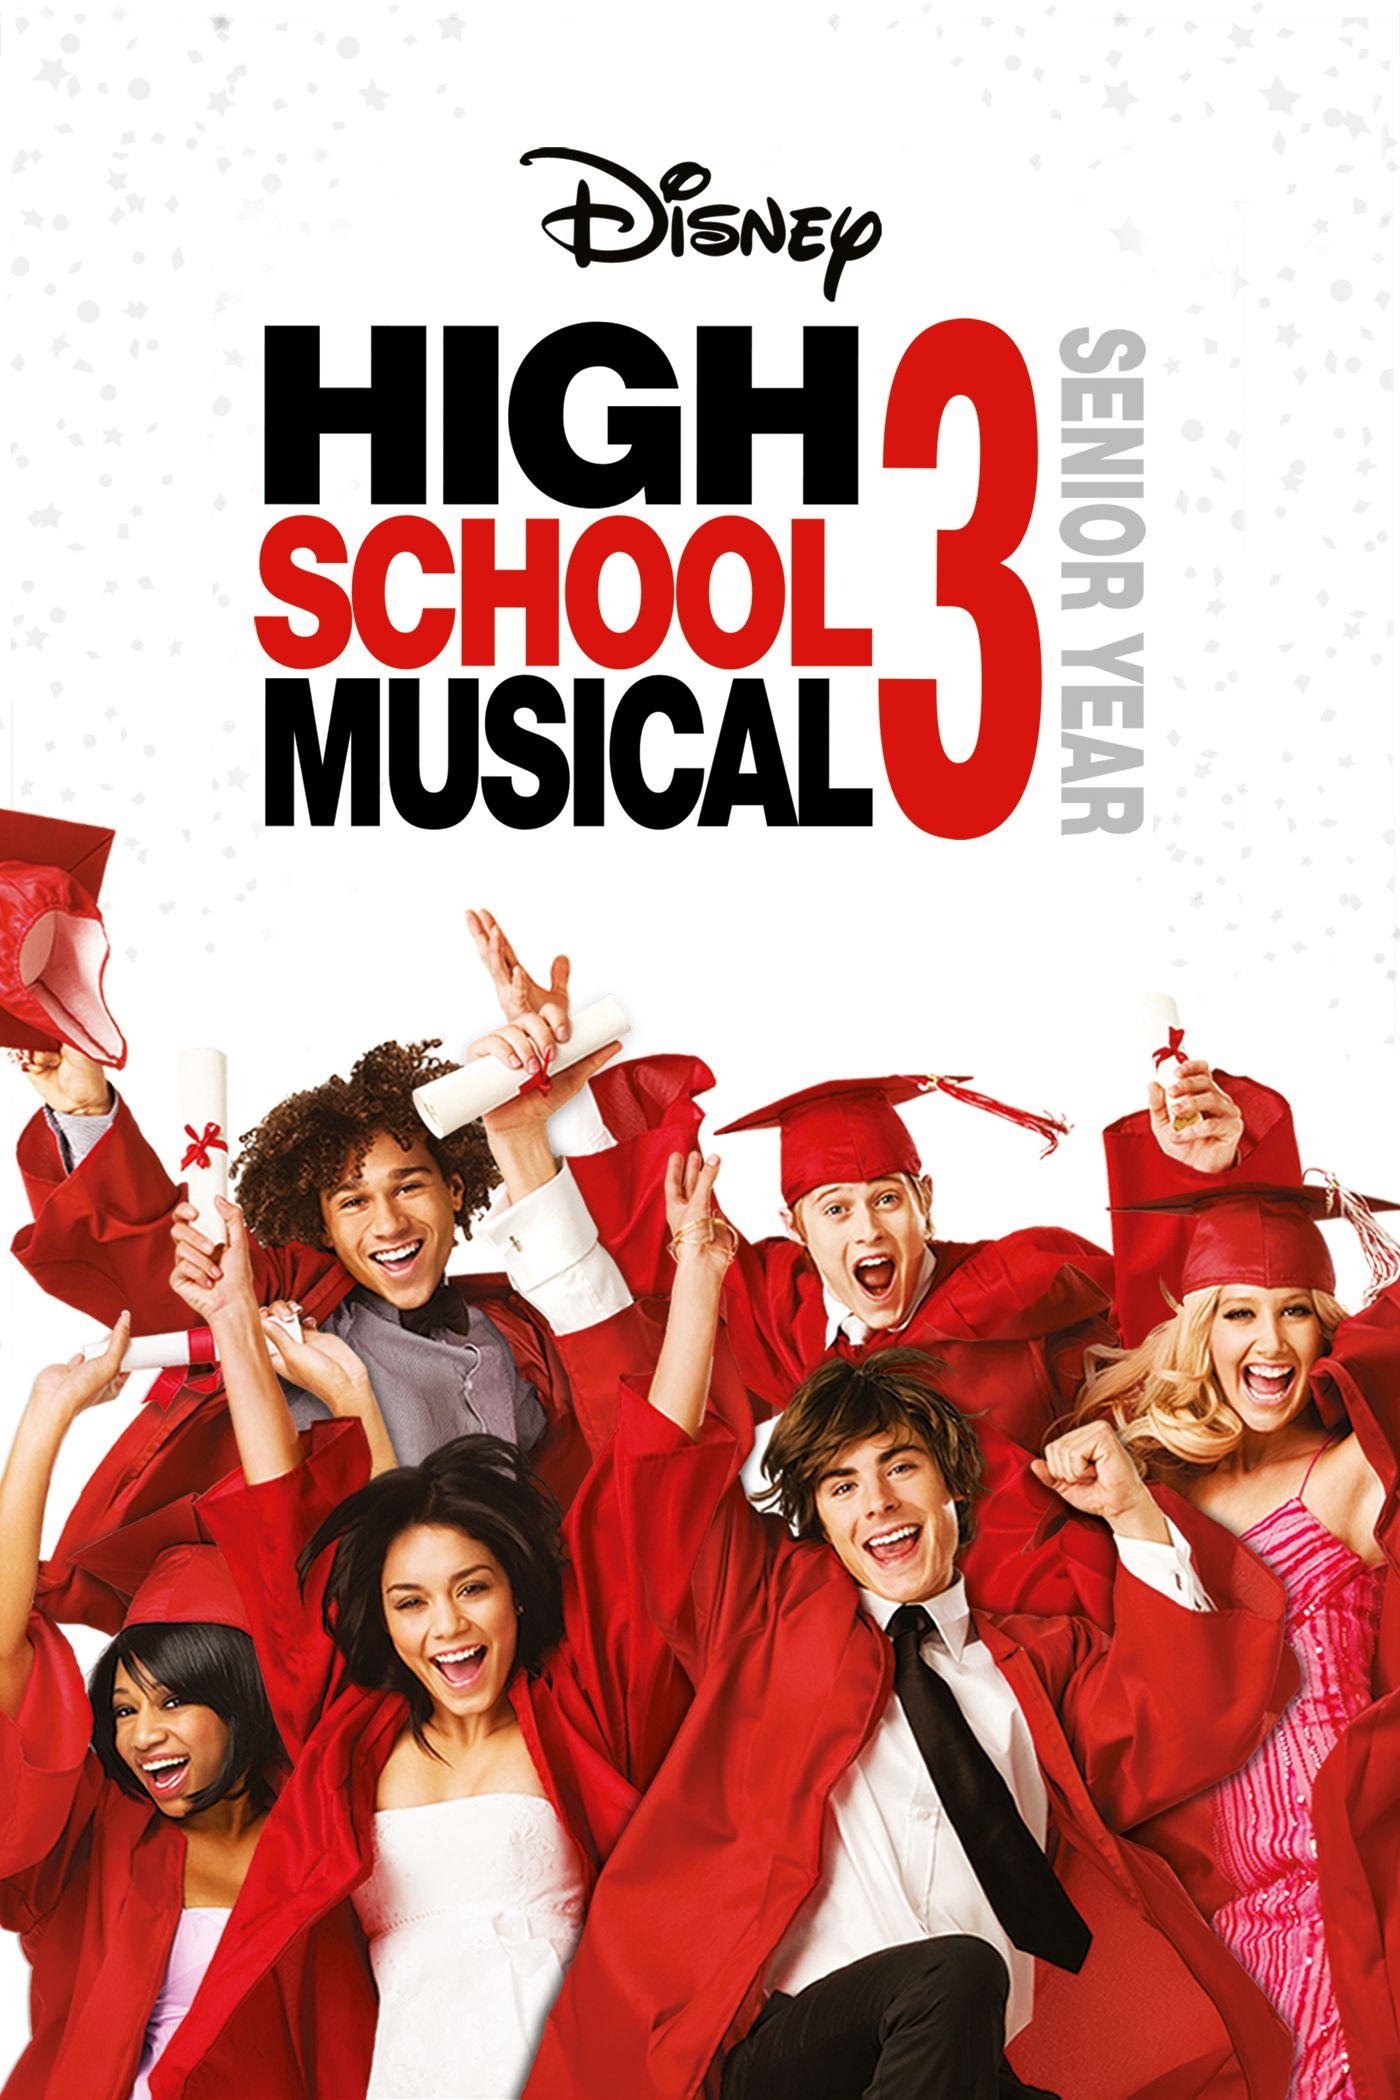 high school musical 3 full movie hd online free